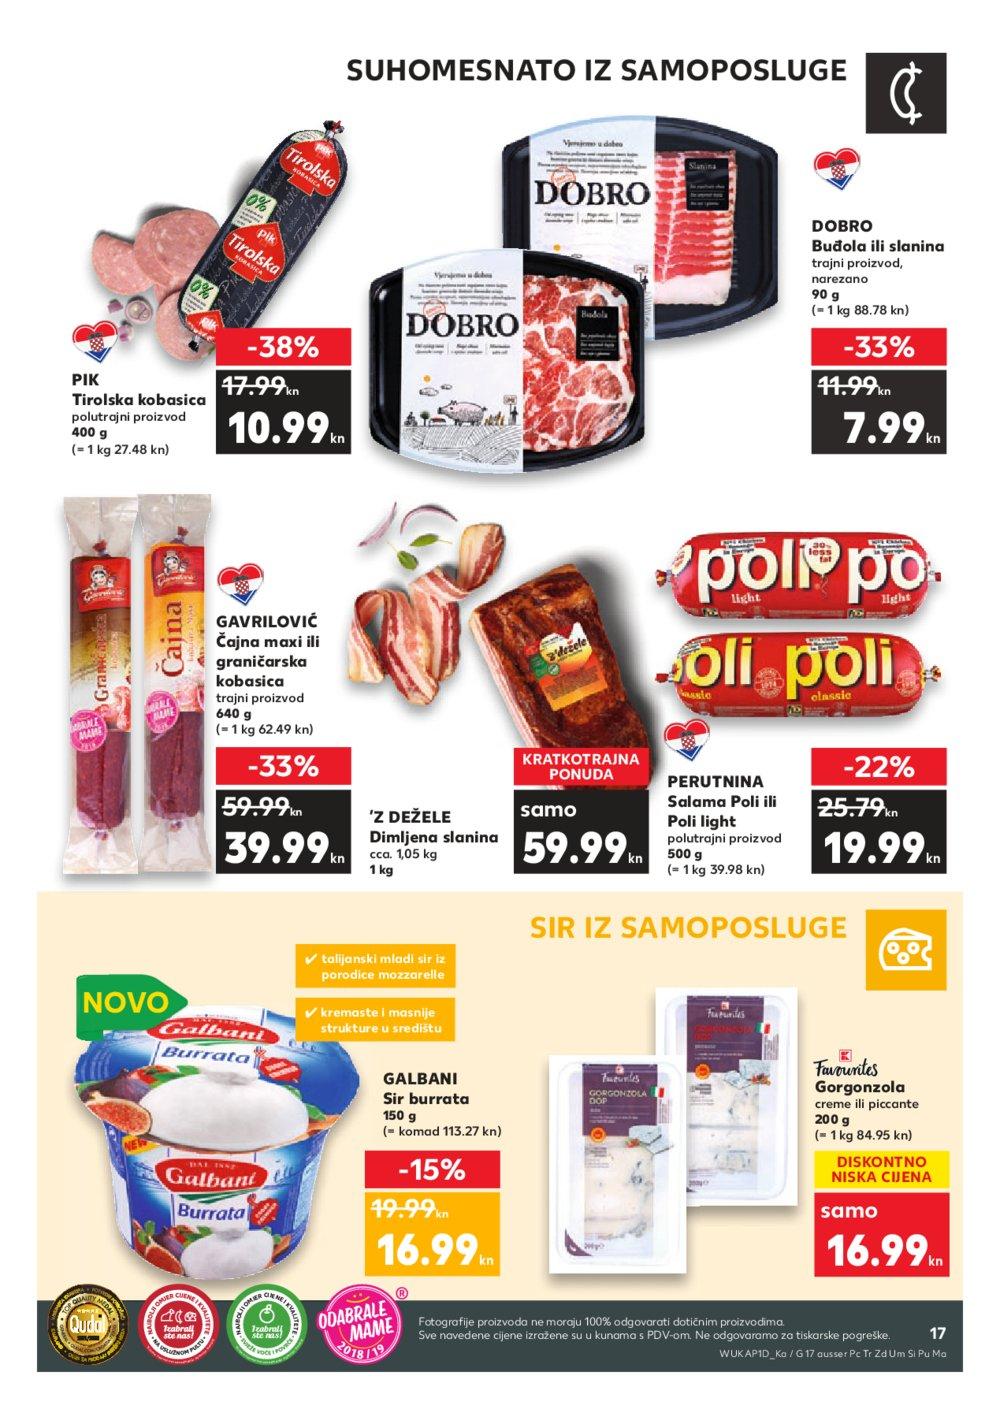 Kaufland katalog akcija 13.06.-18.06.2019.